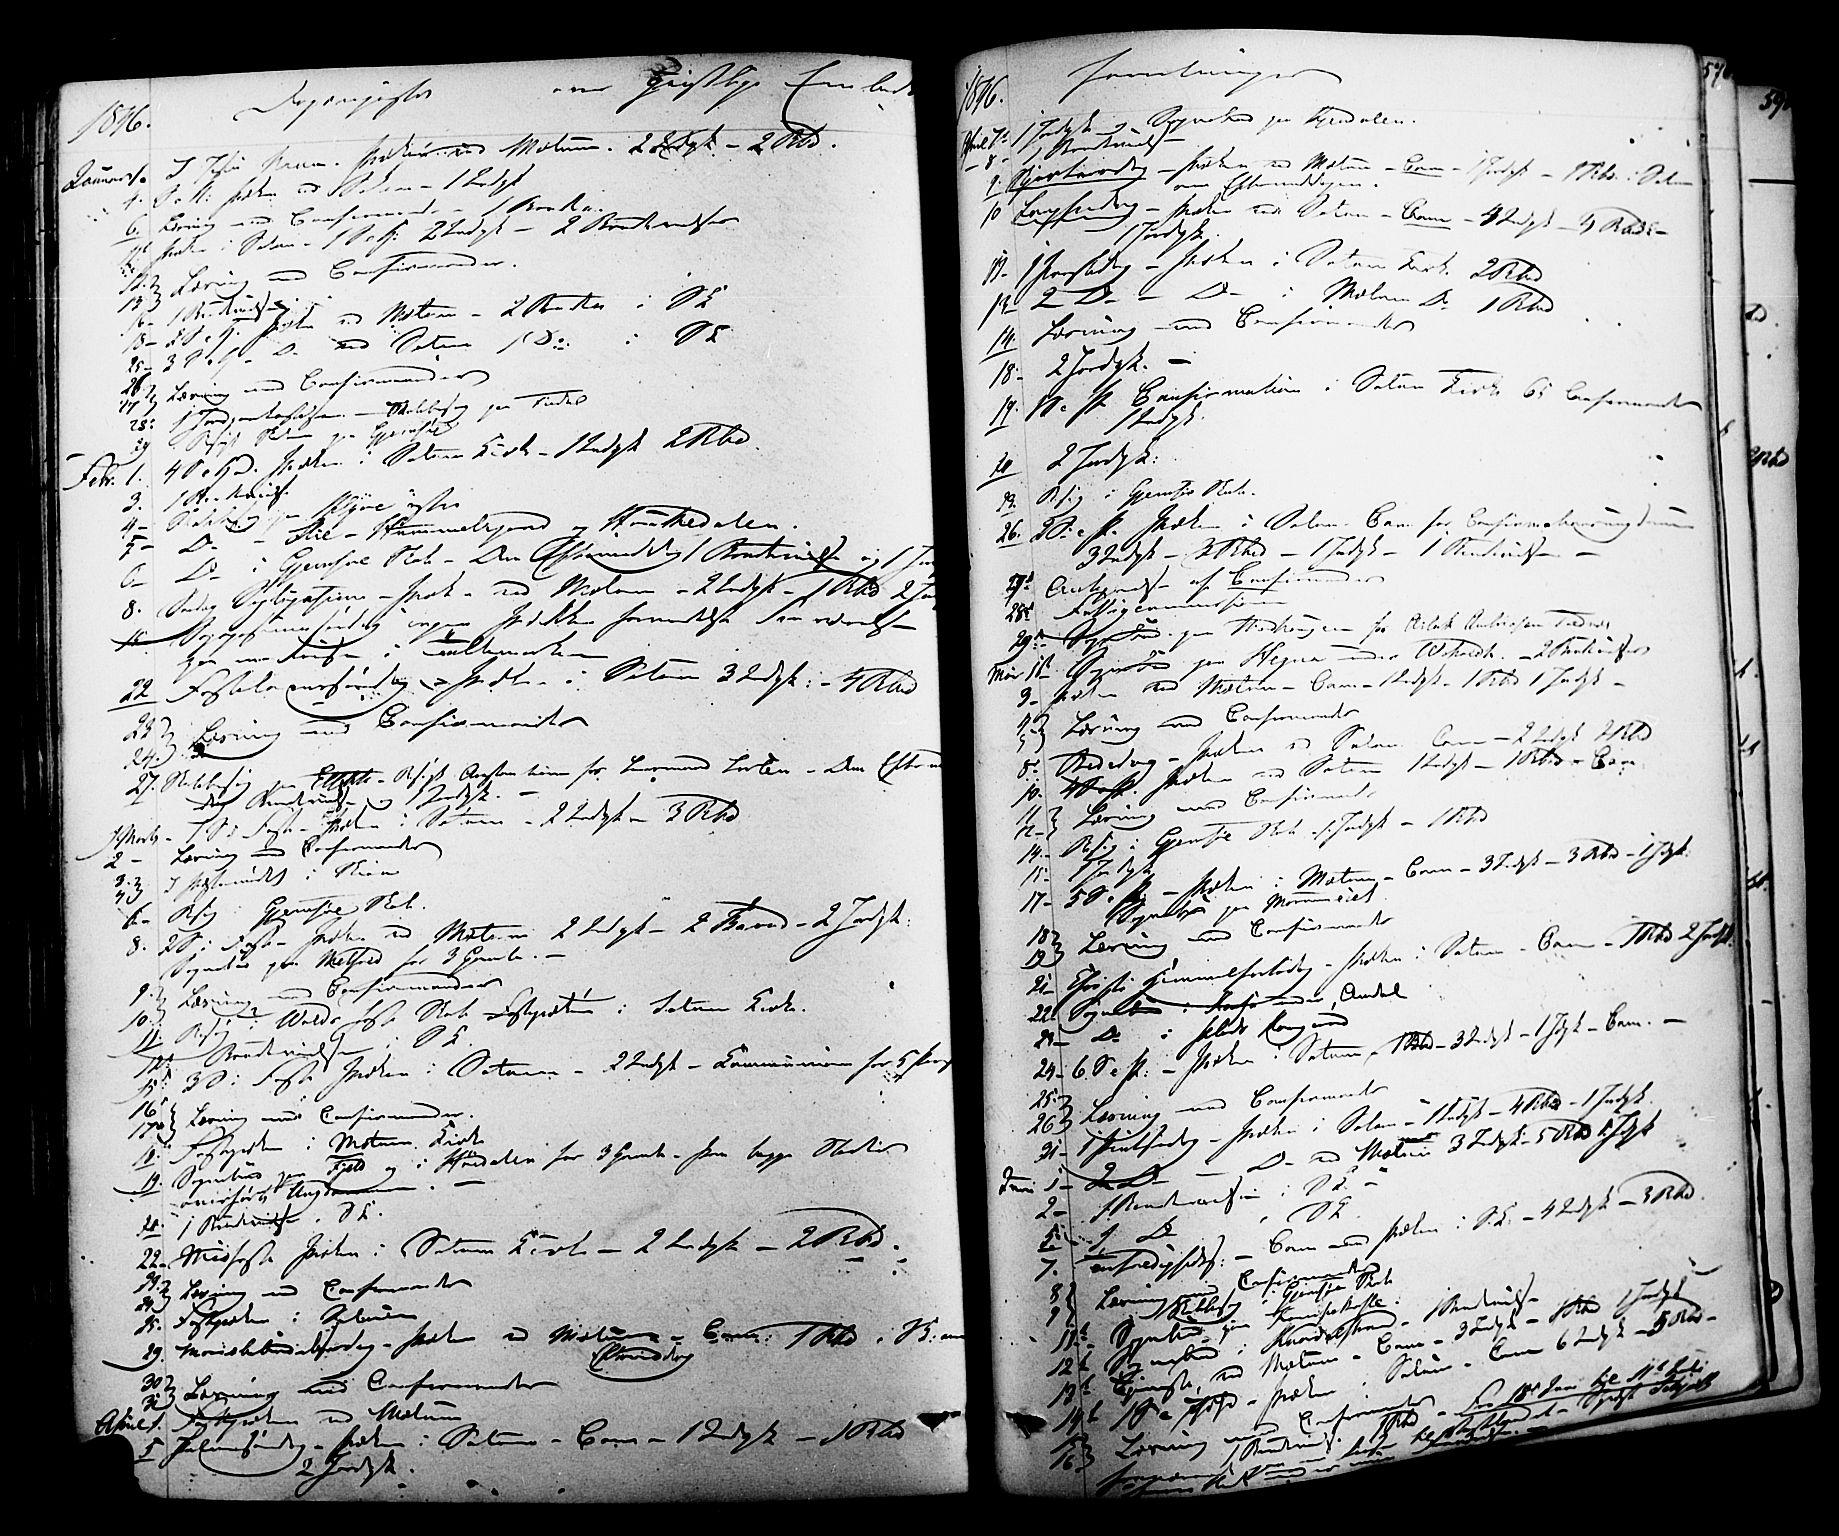 SAKO, Solum kirkebøker, F/Fa/L0006: Ministerialbok nr. I 6, 1844-1855, s. 565